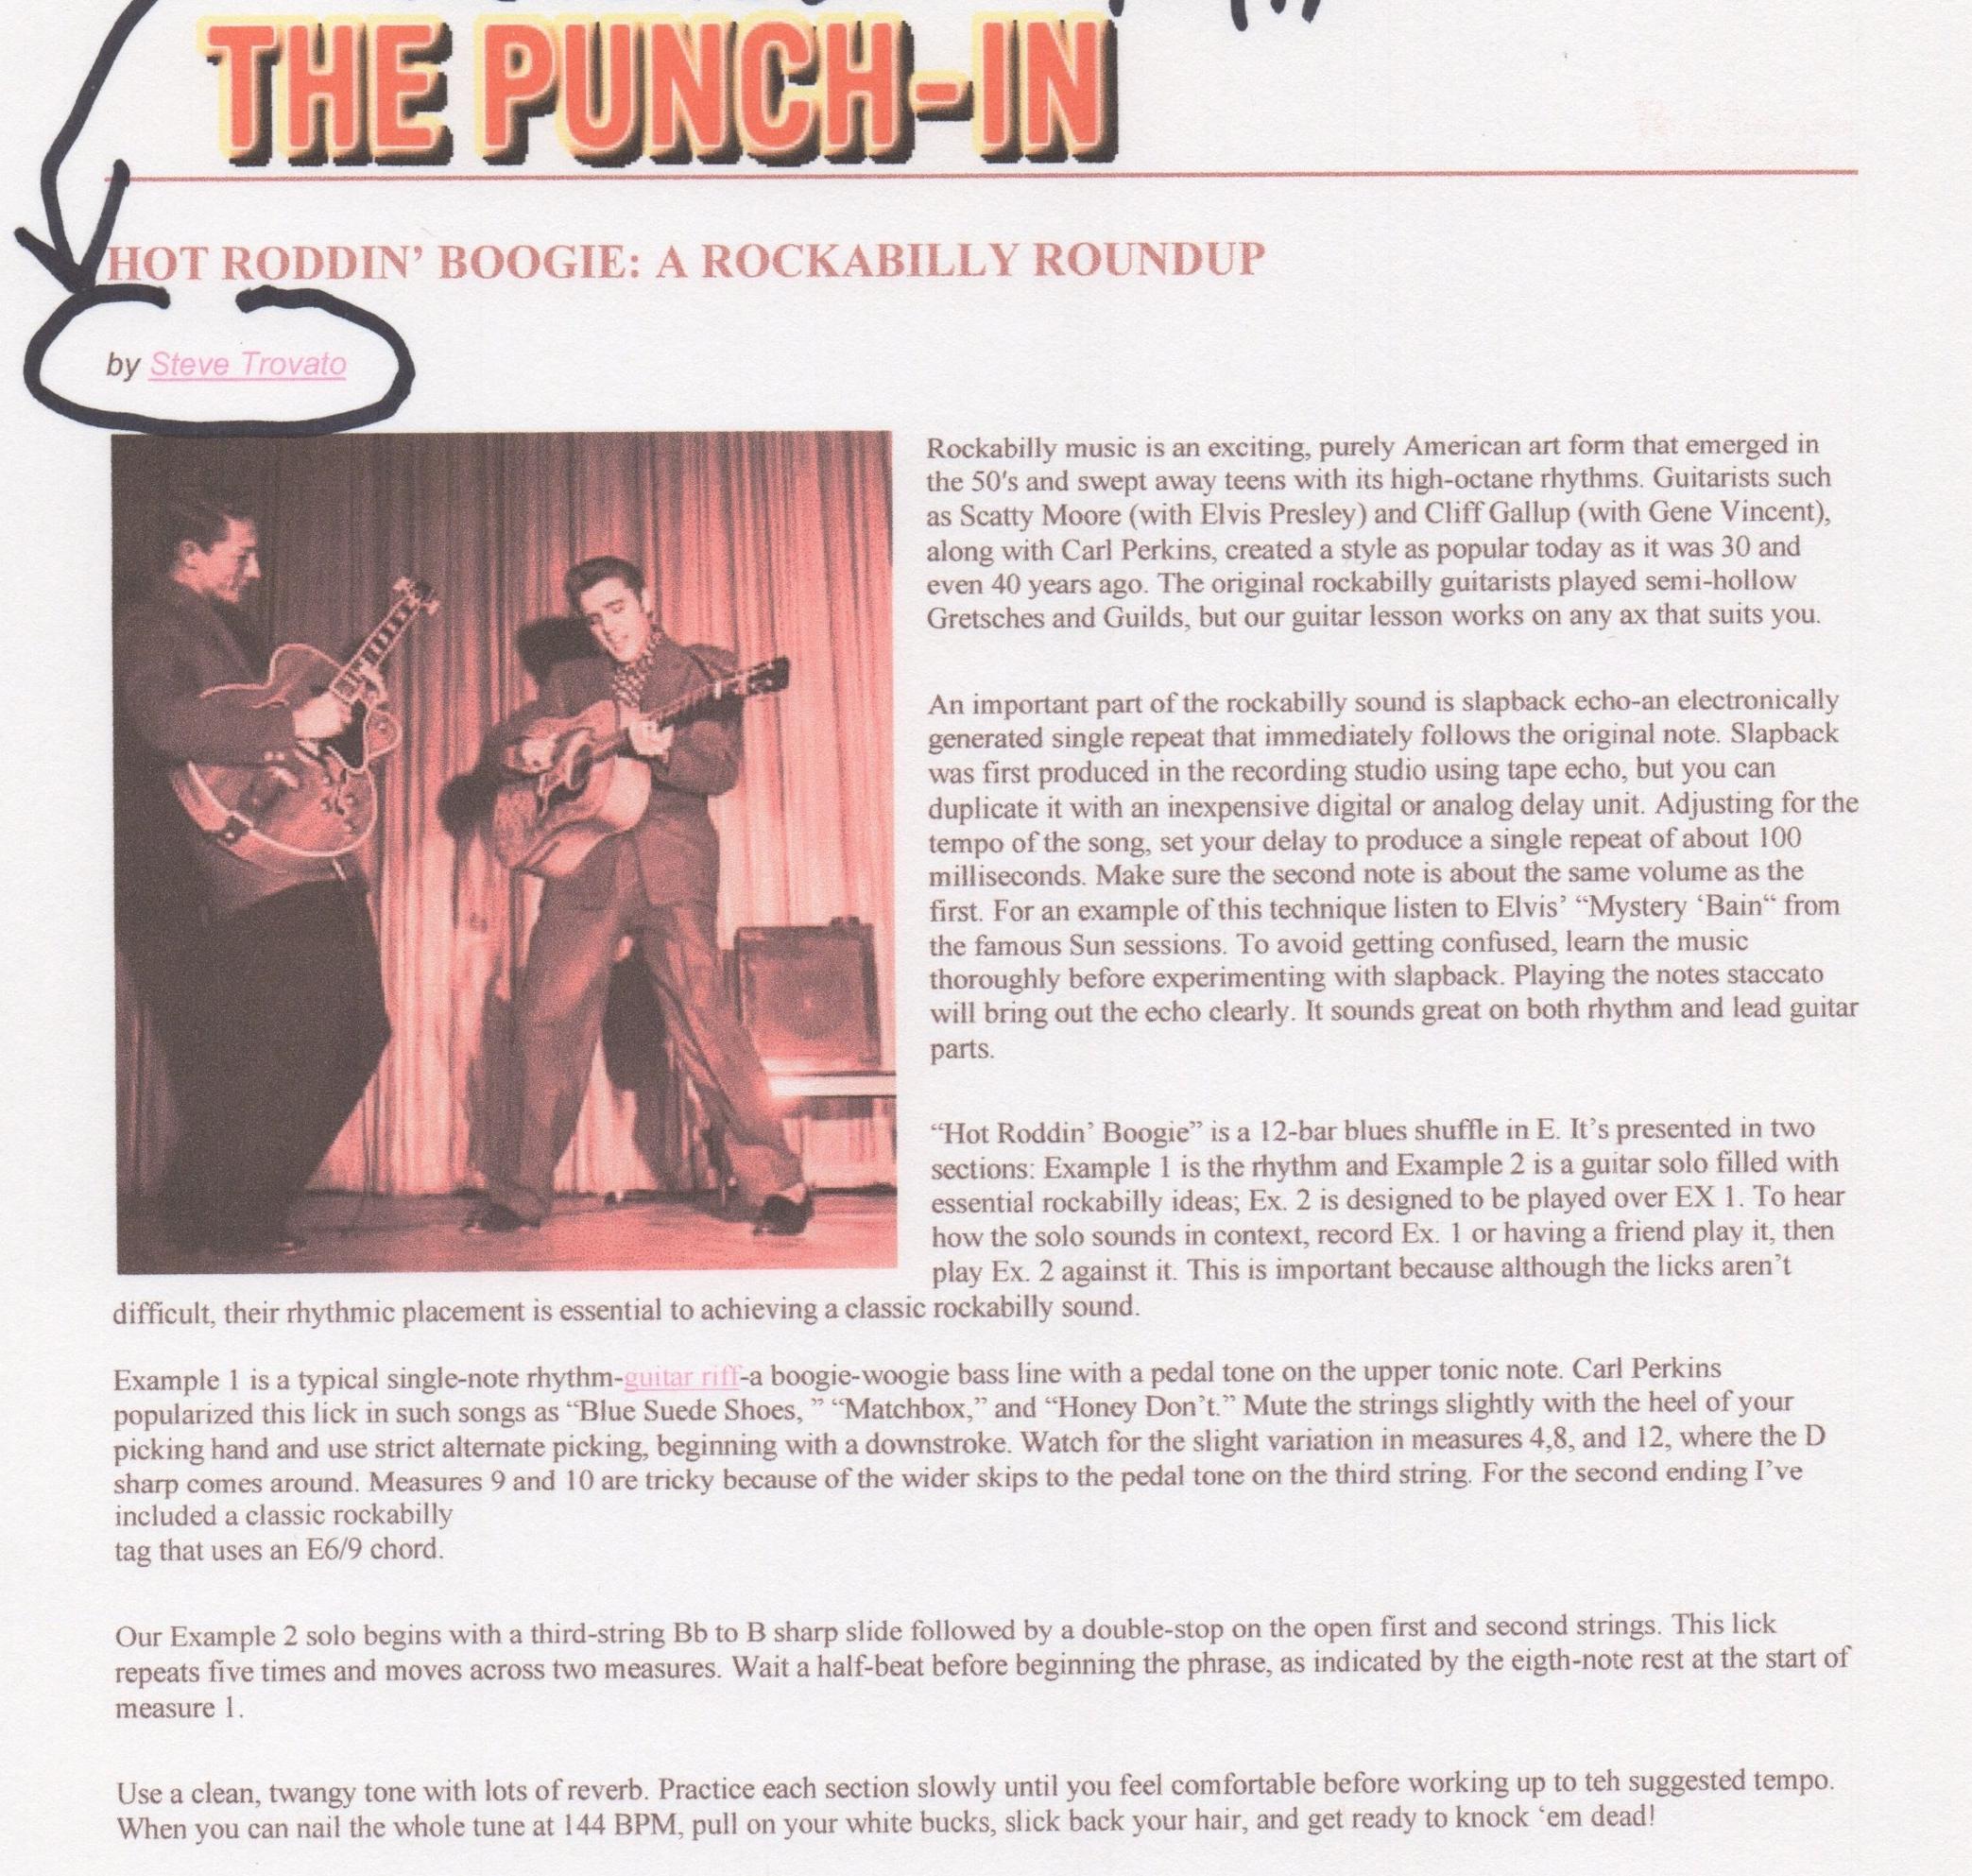 2011_Feb_The Punch In_Hot Roddin' Boogie - Rockabilly Roundup 1.jpeg